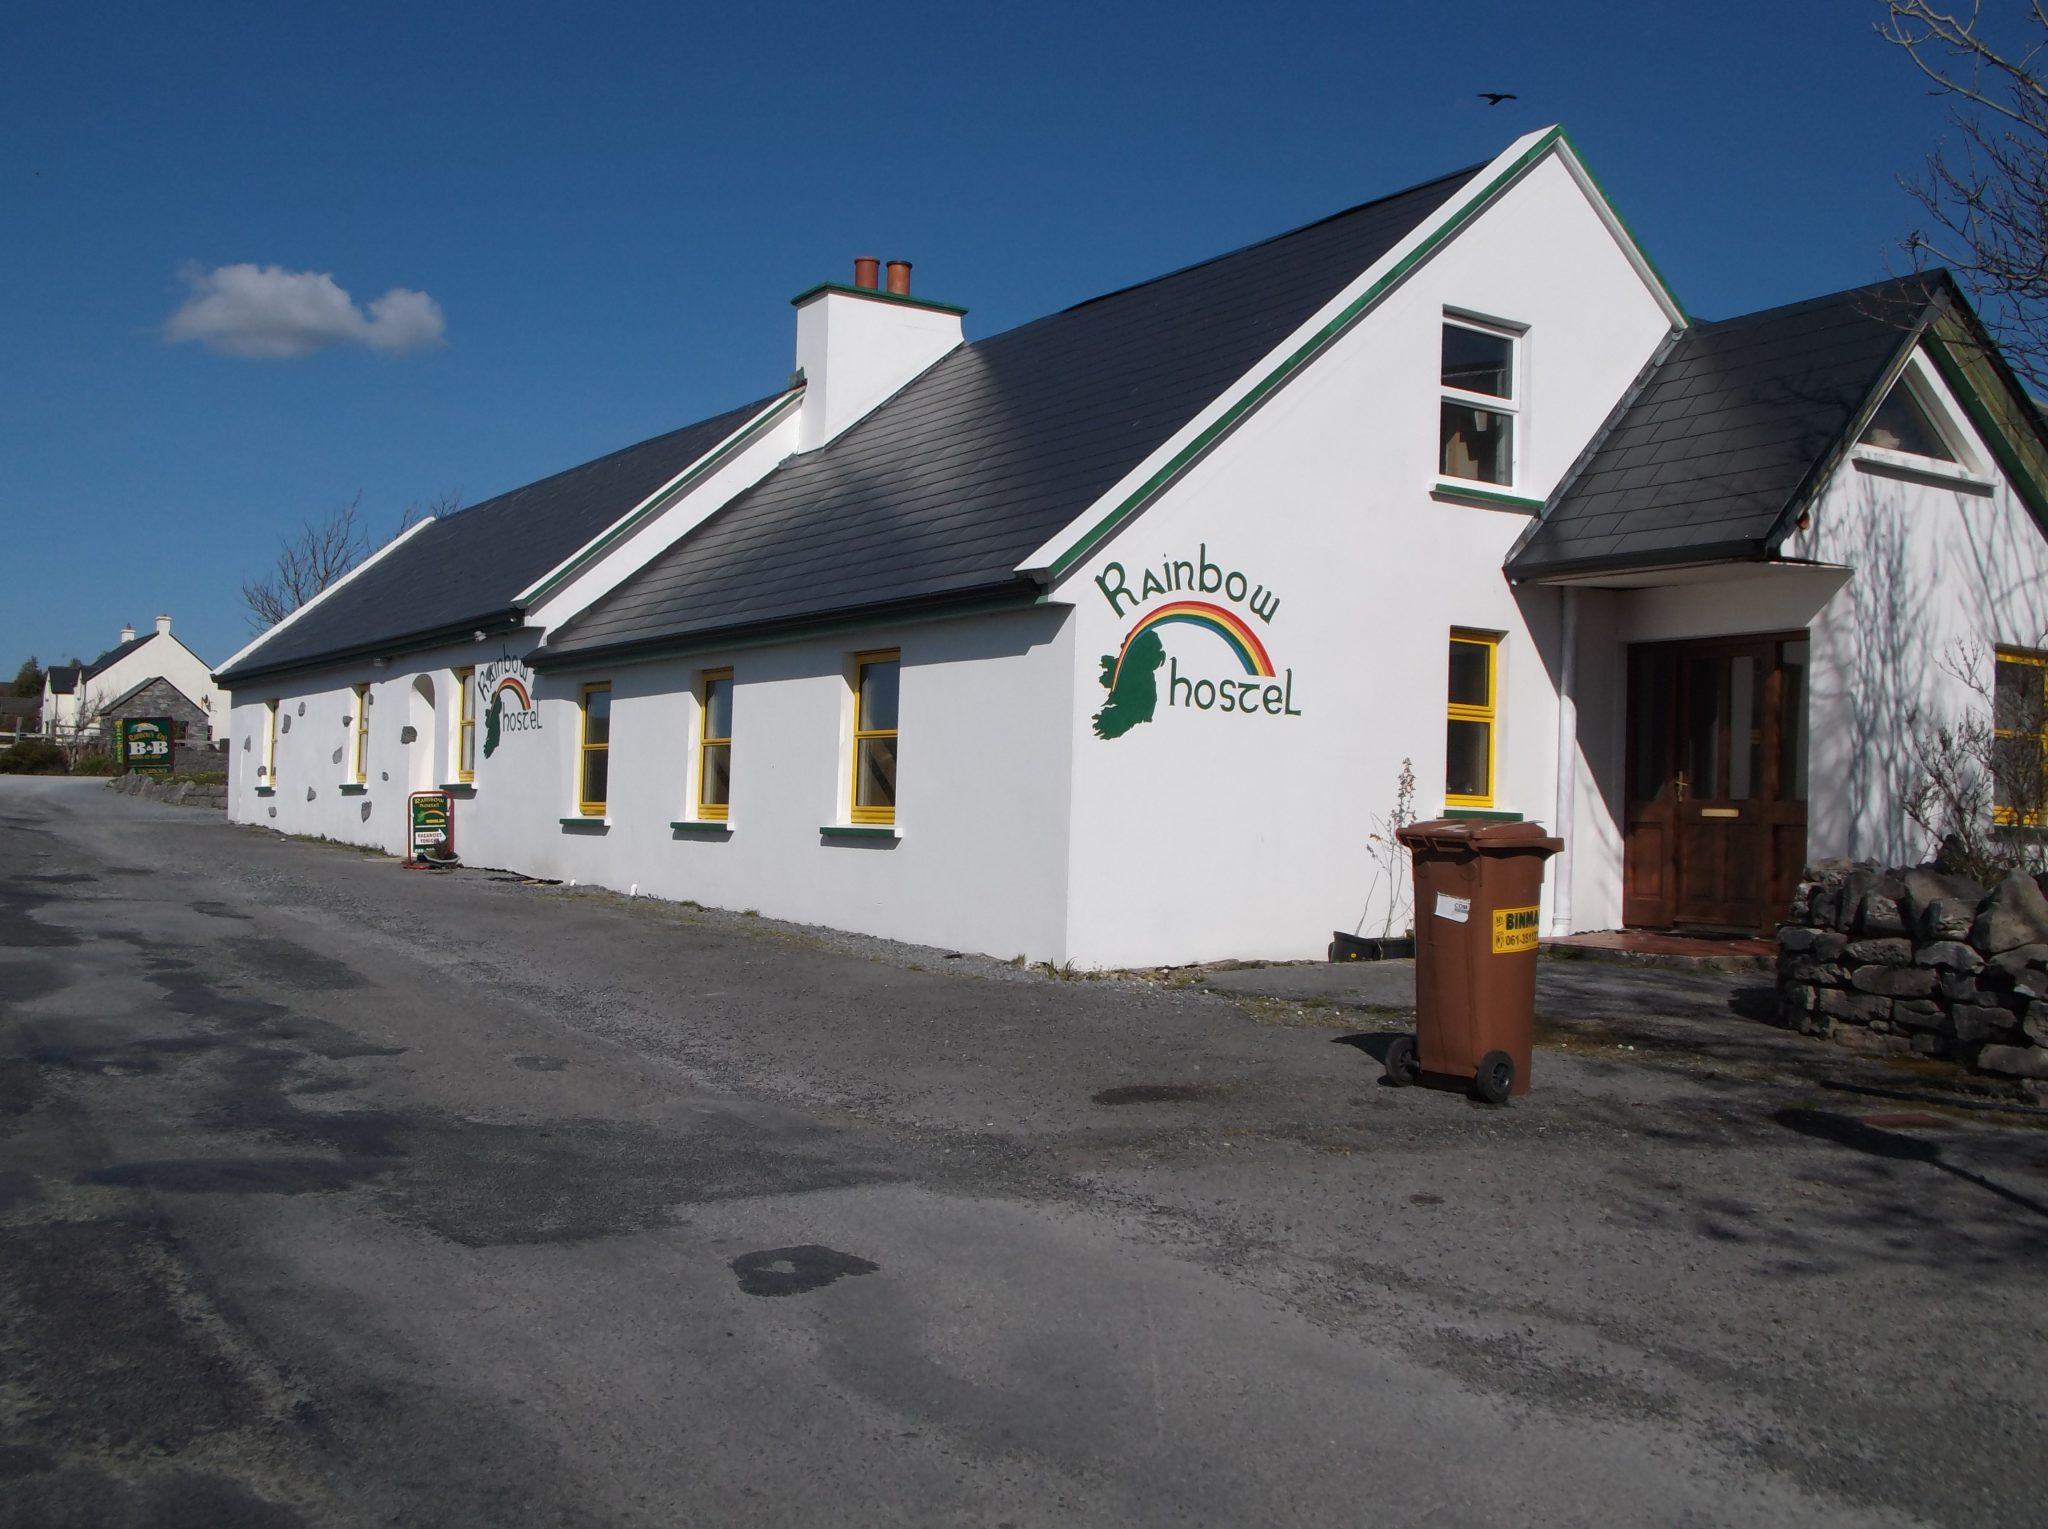 Doolin Rainbow Hostel